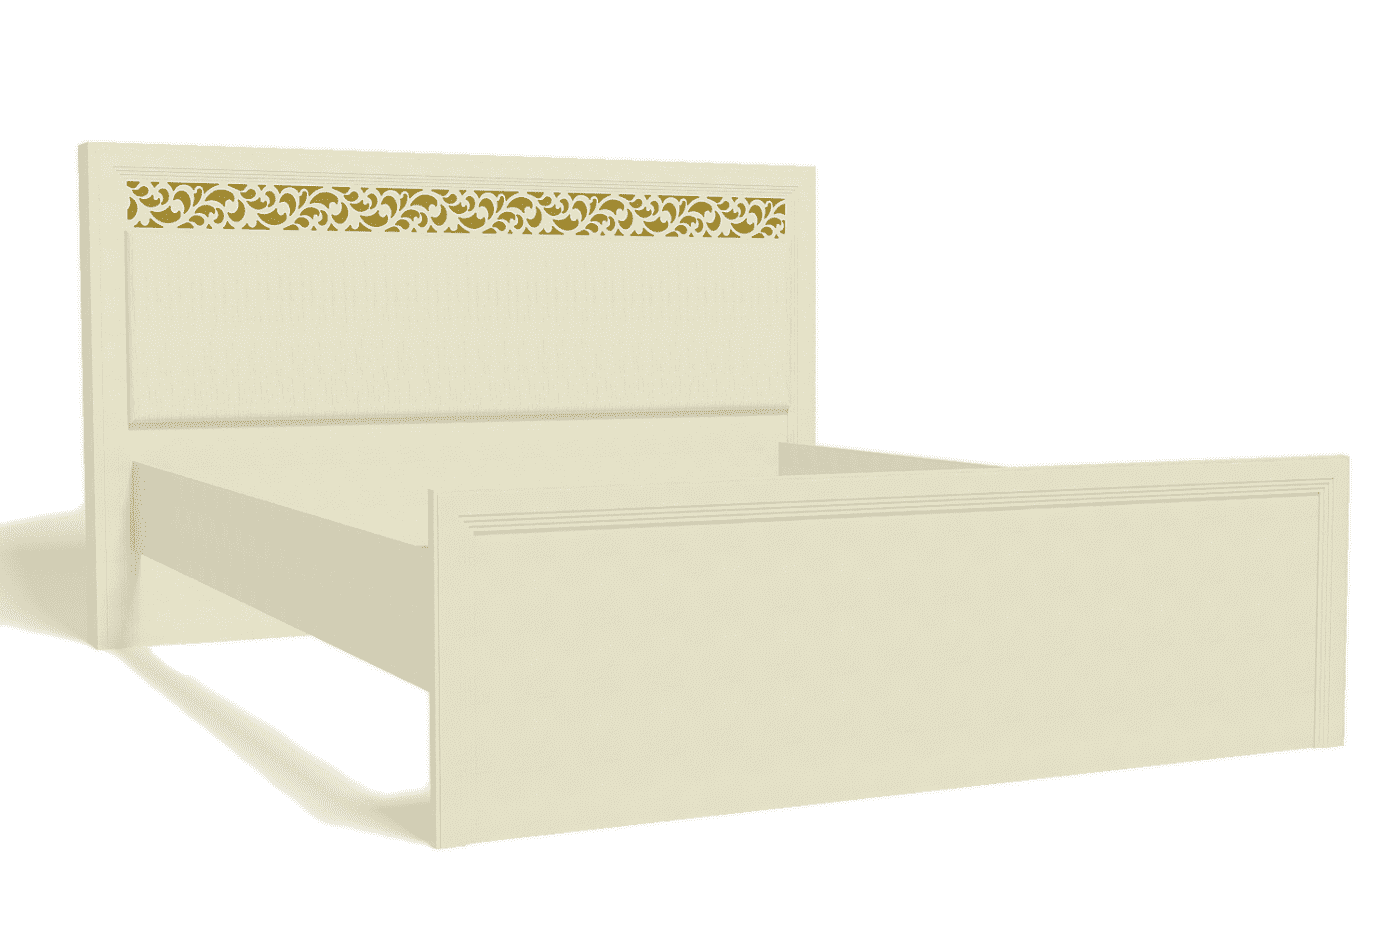 Спальня Ливадия Комплект 3 - фото Кровать 140*200 см без ортопеда, без матраса Ливадия Л8а